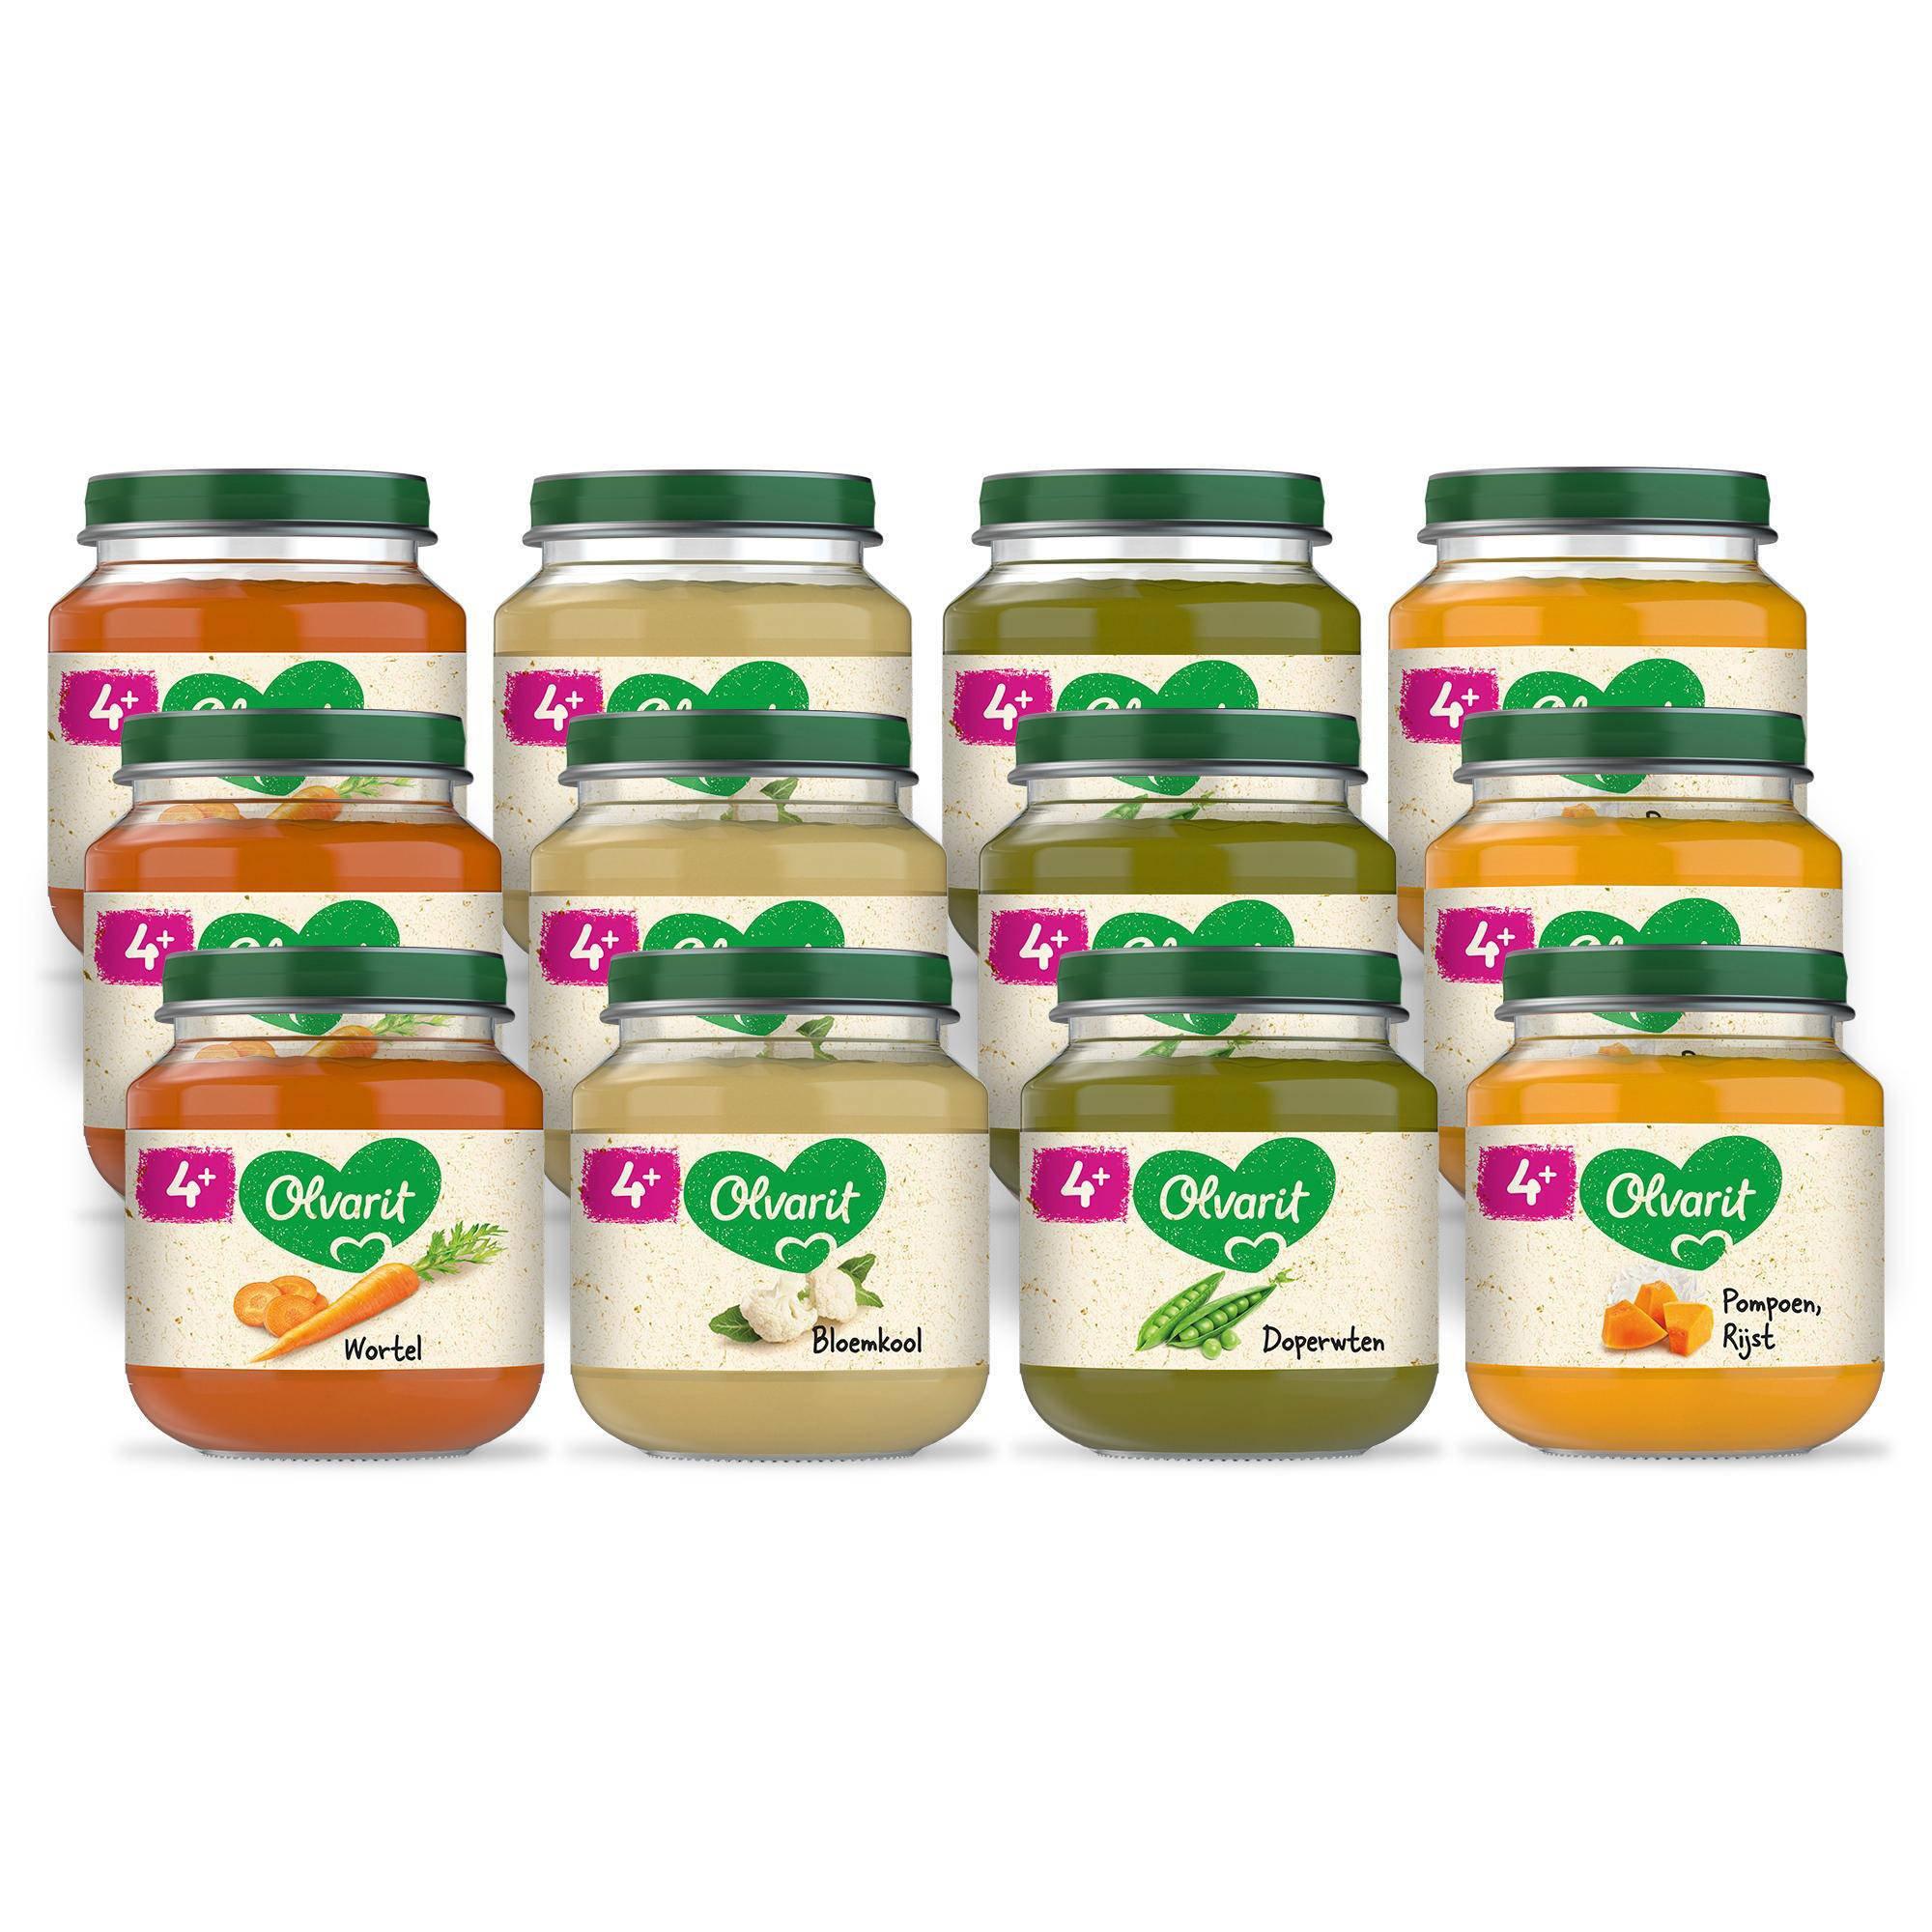 Olvarit babyvoeding menu 4+ mnd maaltijd (12x 125 gr)